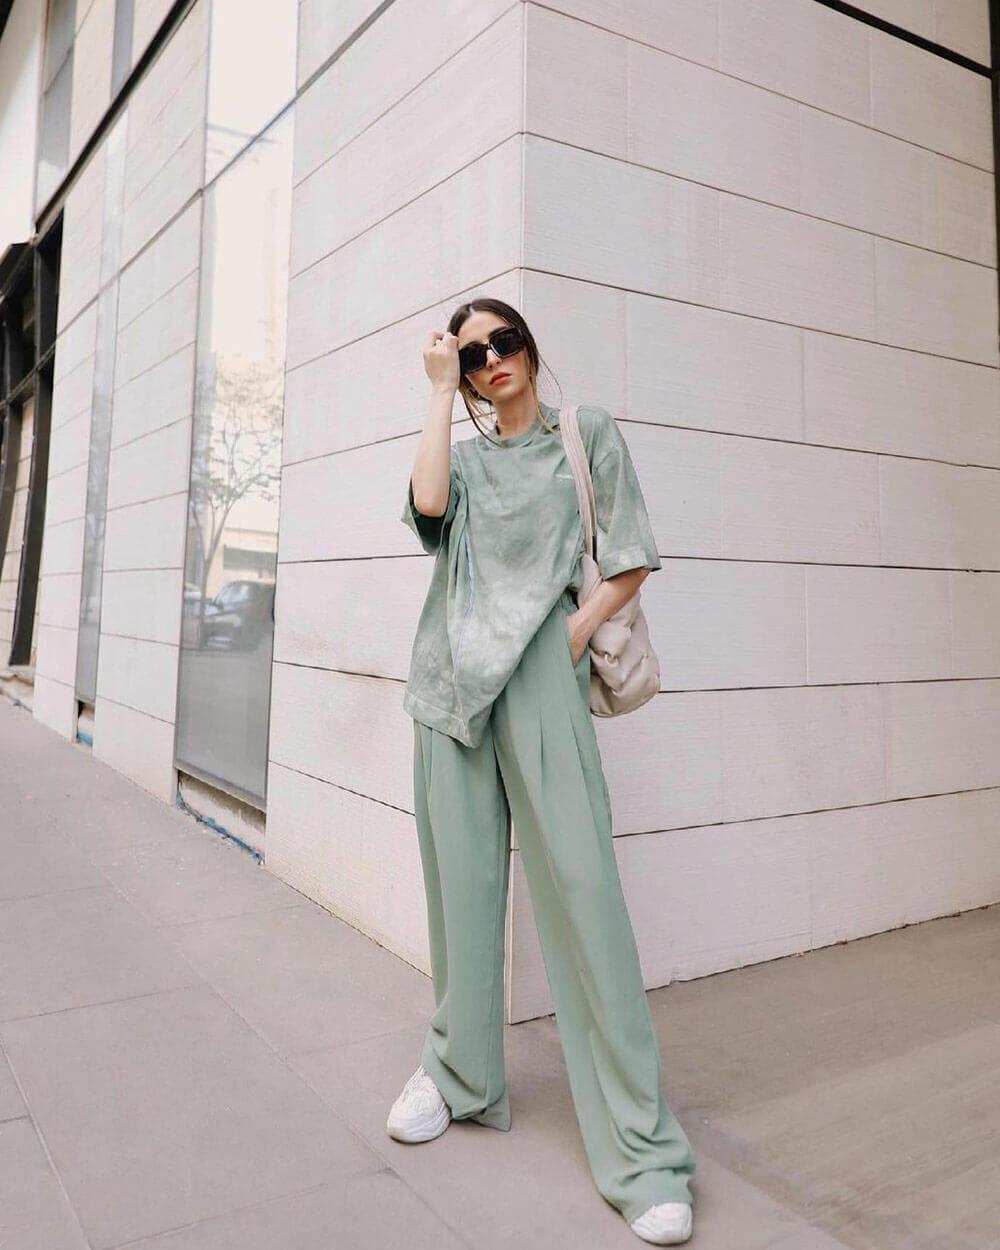 ASOS petite clothing fashion brand